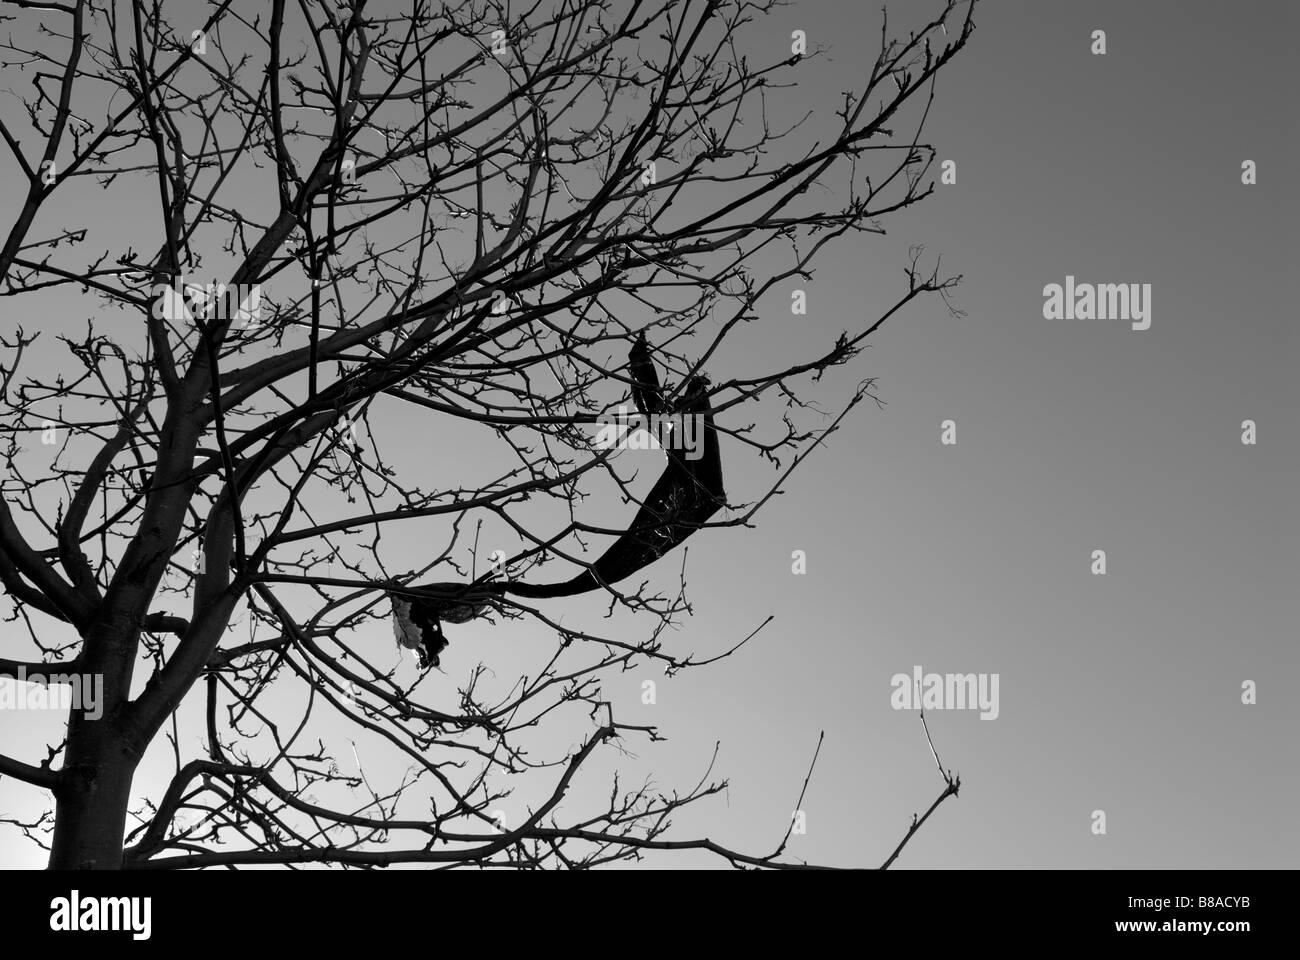 PLASTIC LITTER CAUGHT IN TREE - Stock Image